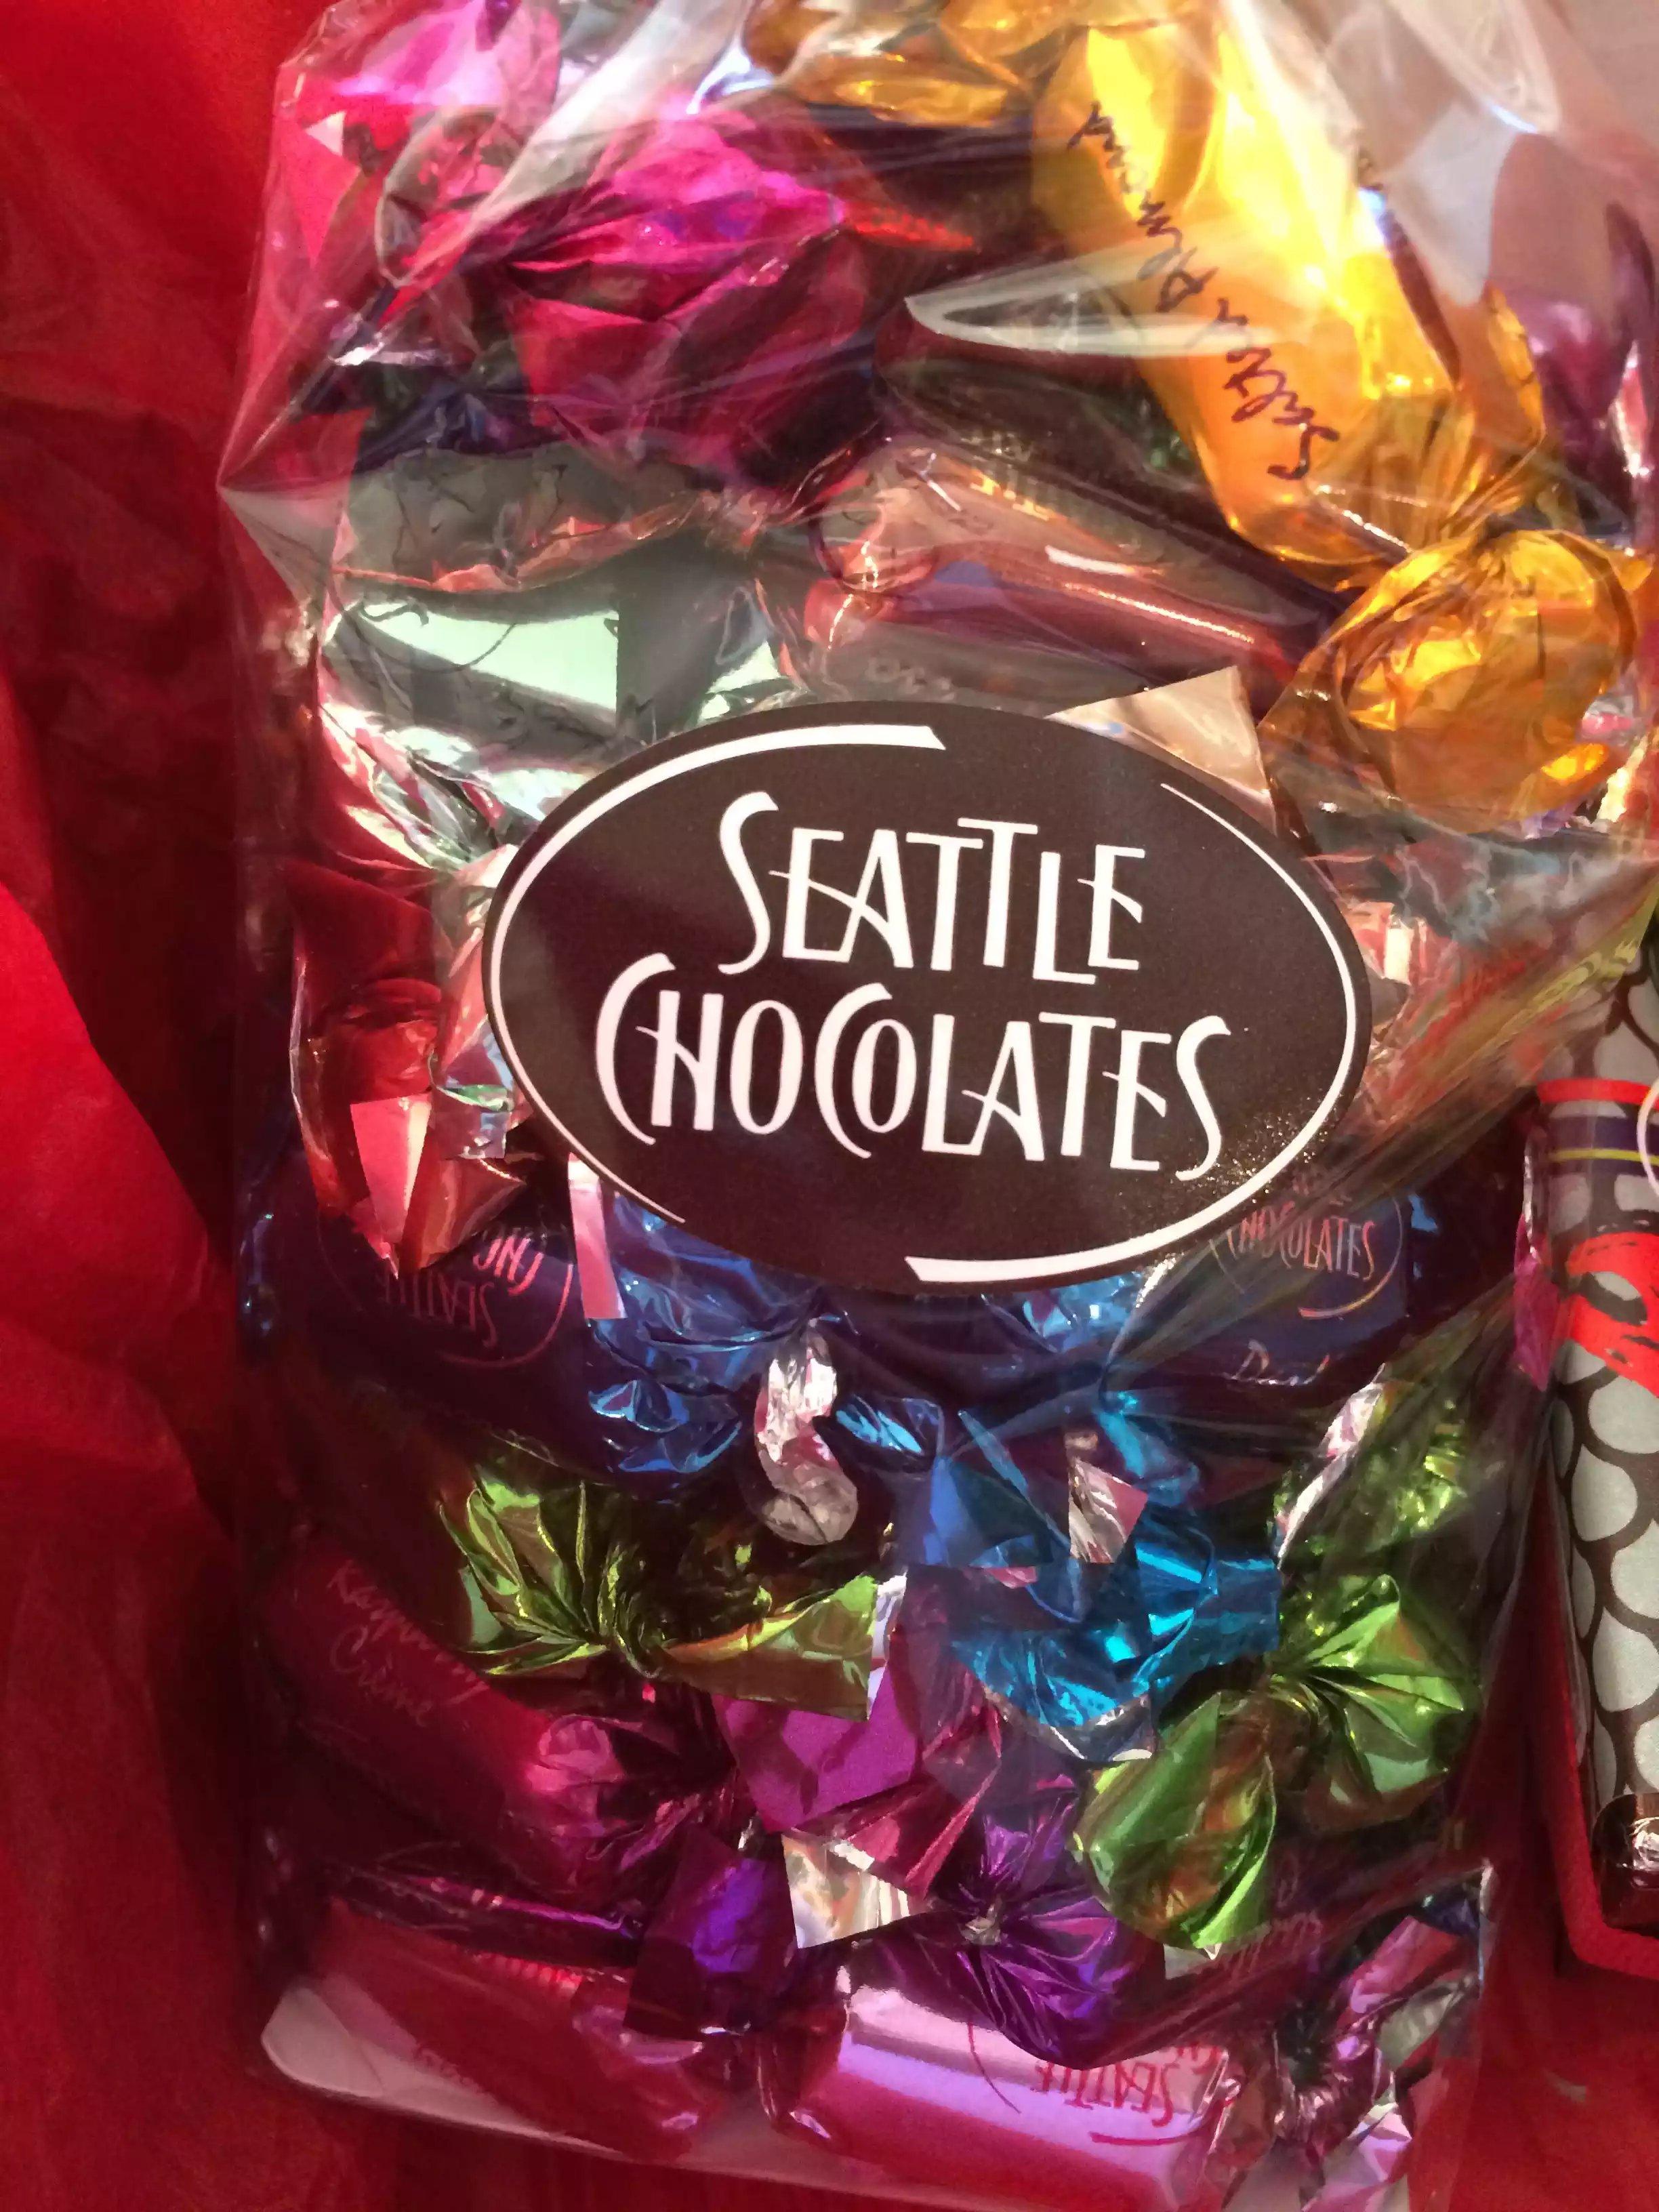 Chocolategives by Seattle Chocolates | Lukewarm Legumes